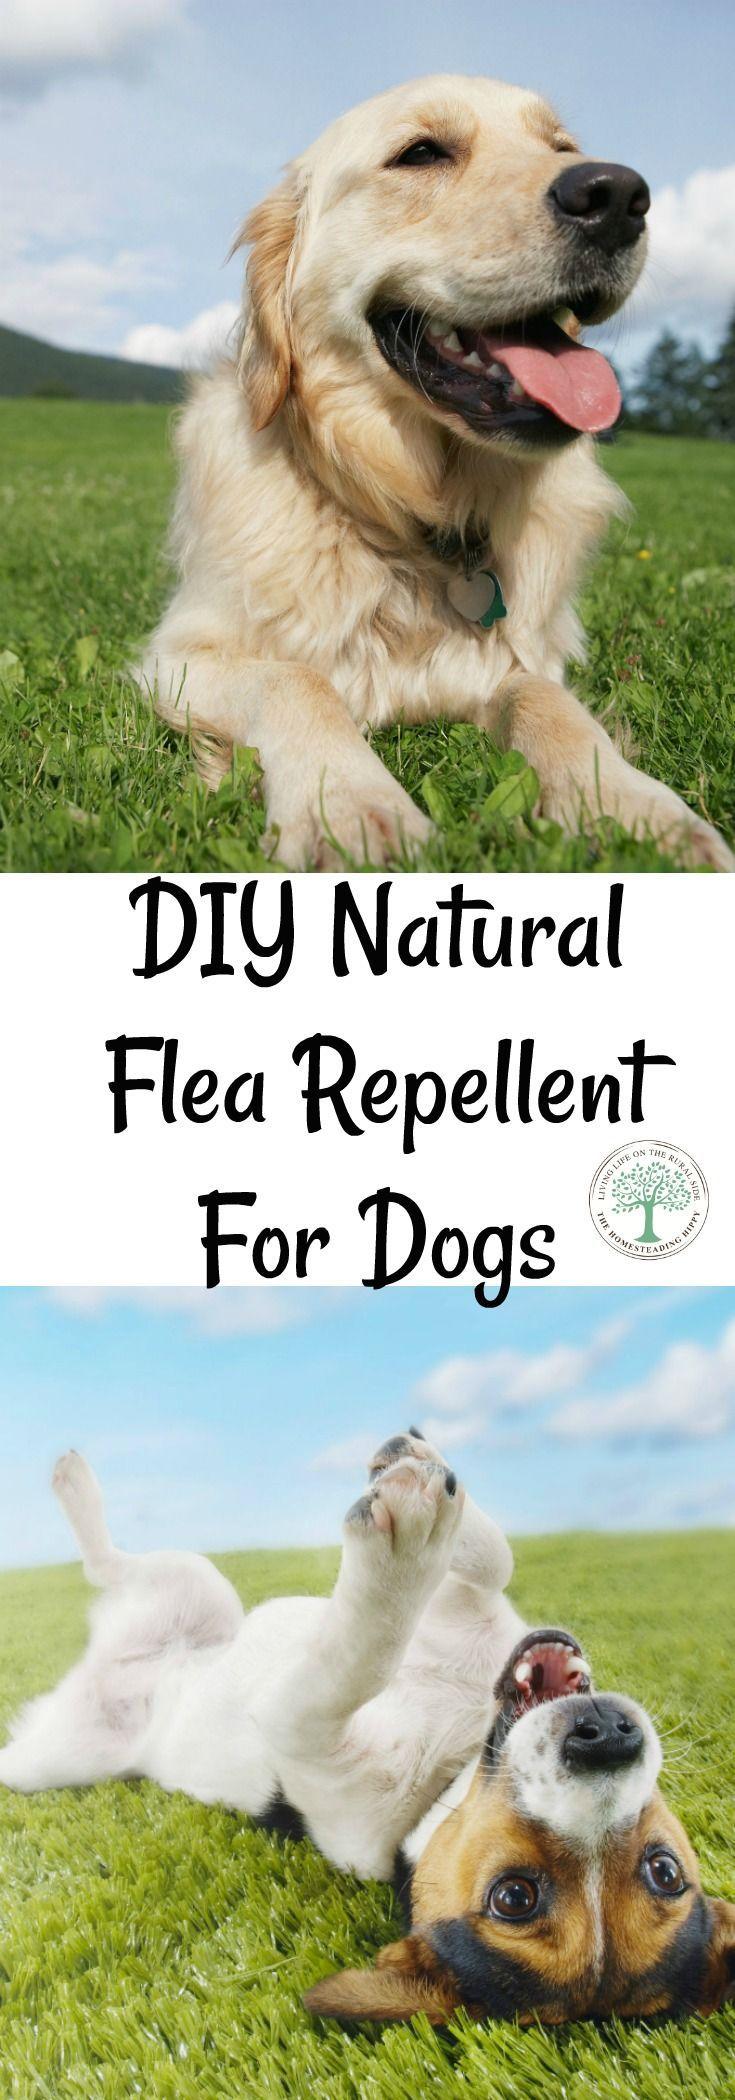 best 25 flea repellant ideas on pinterest natural flea remedies dog flea remedies and. Black Bedroom Furniture Sets. Home Design Ideas